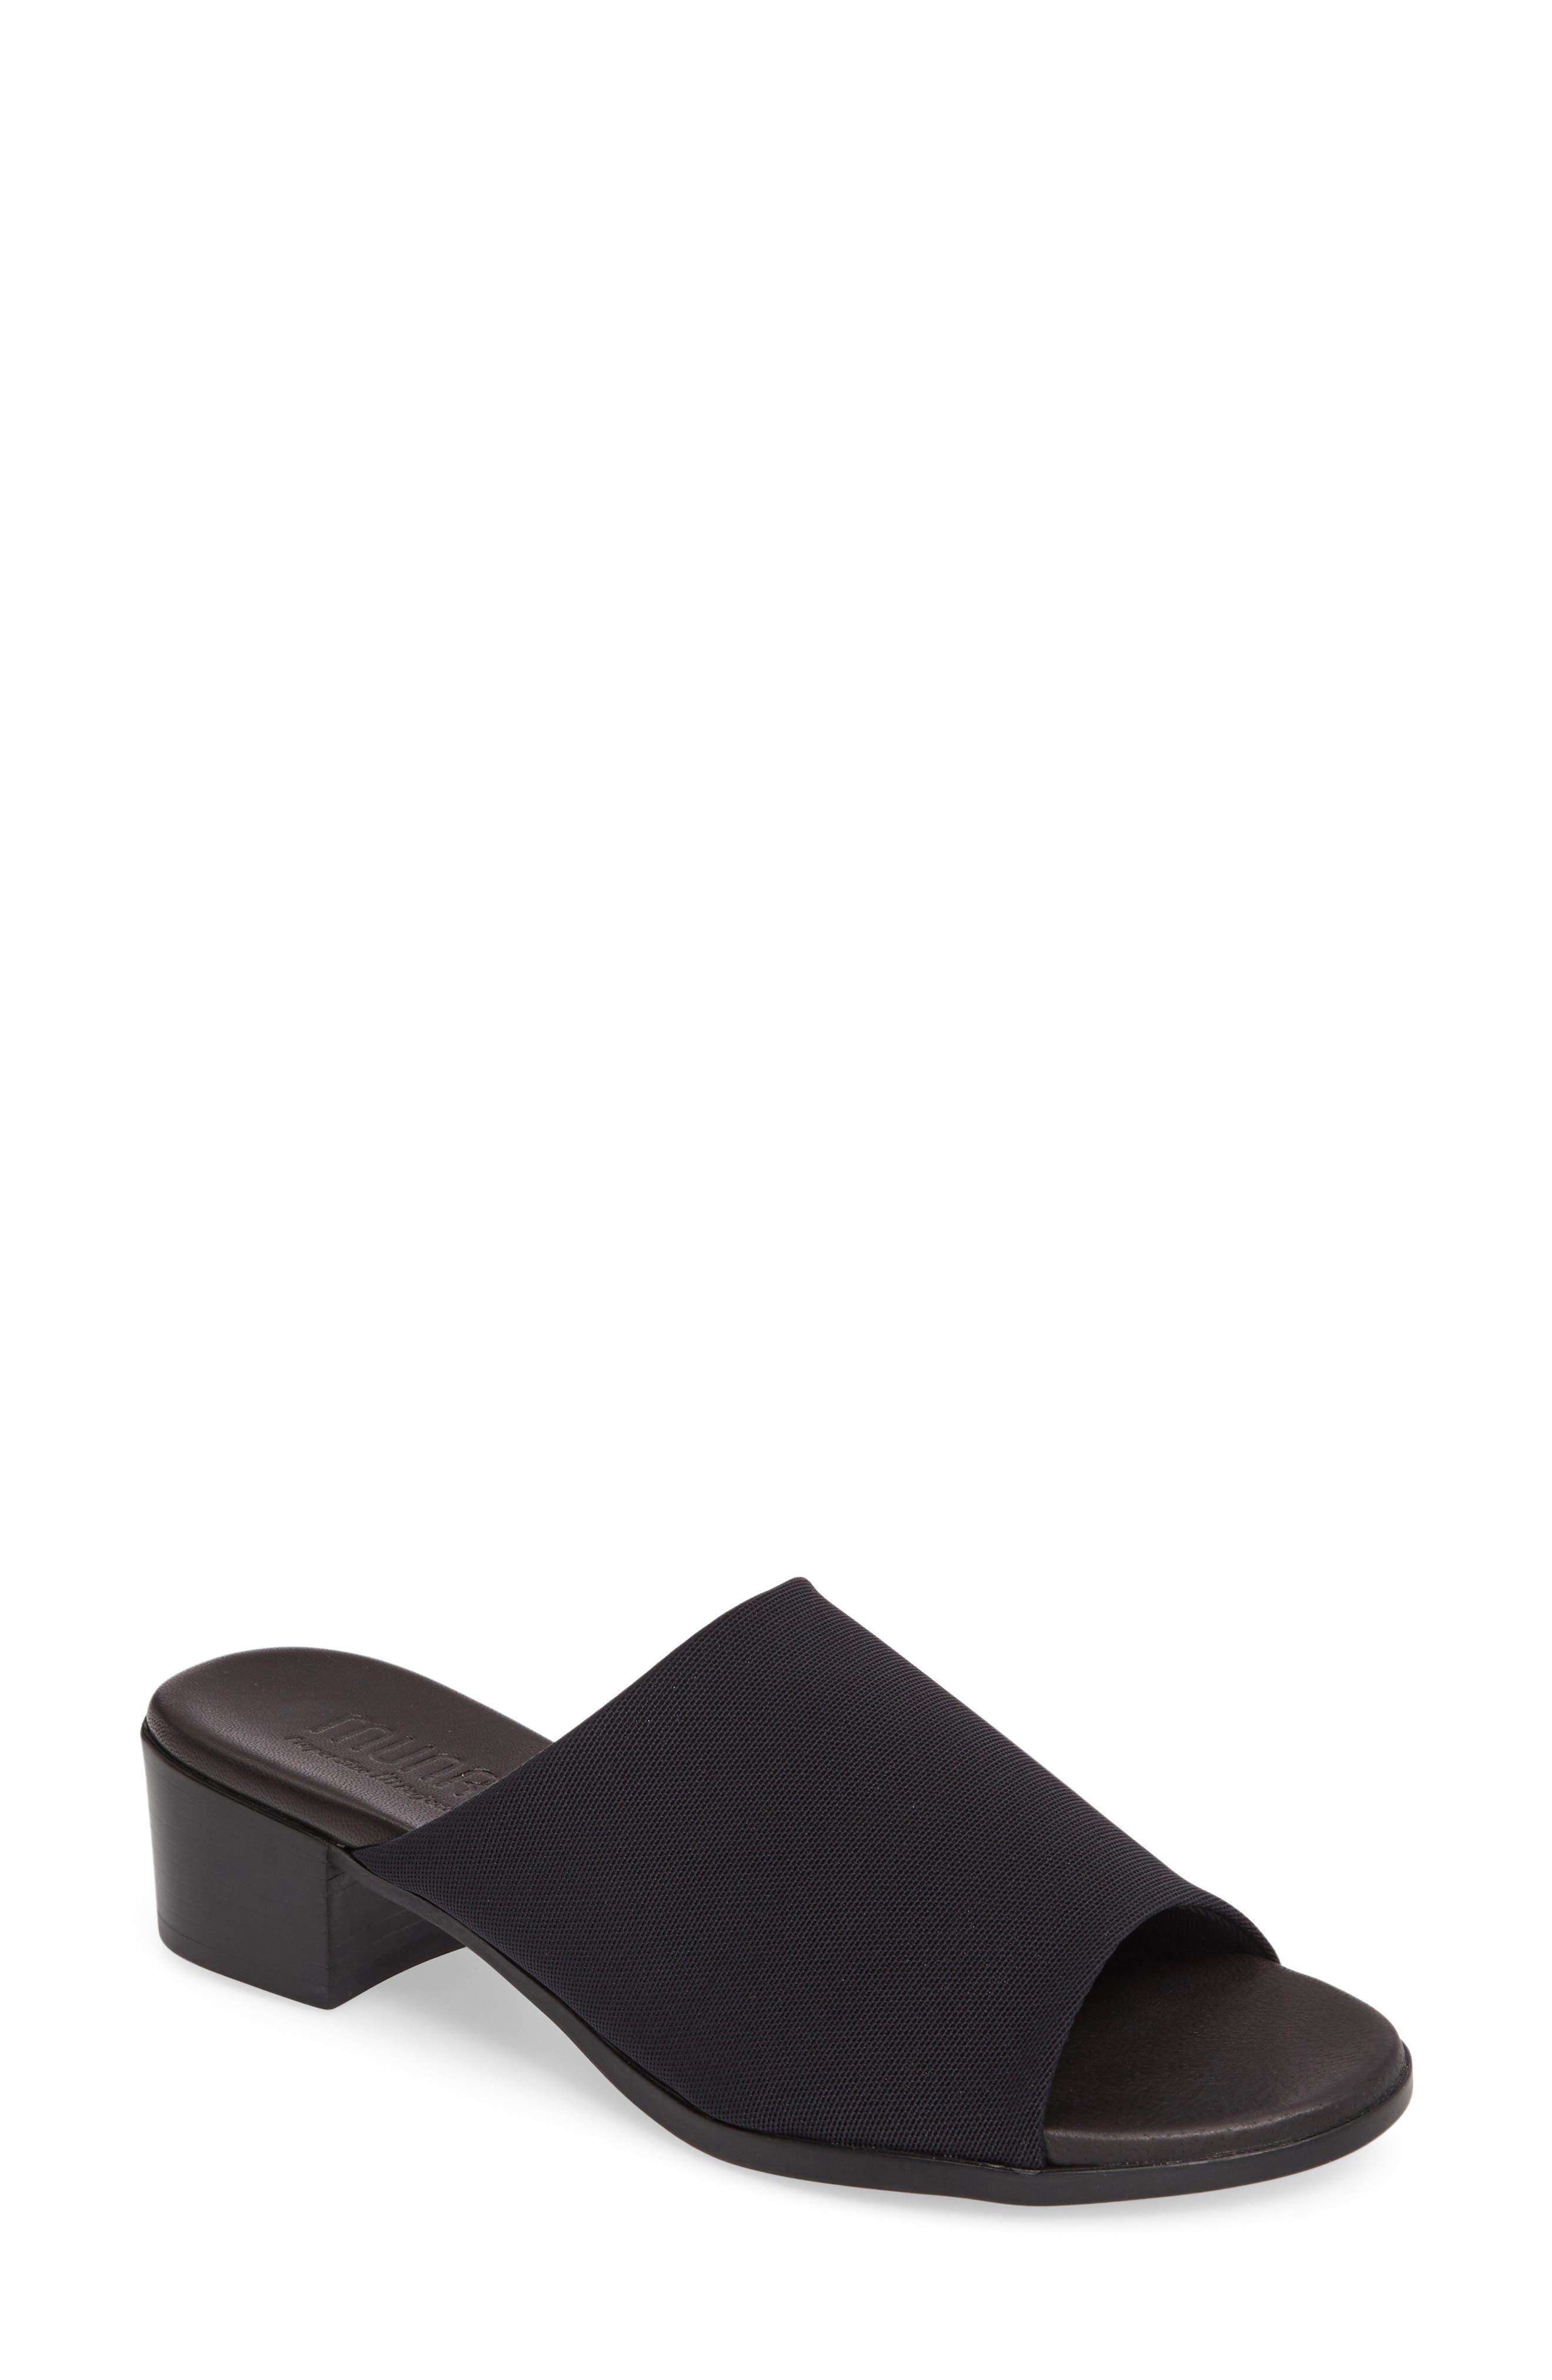 MUNRO Beth Slide Sandal, Main, color, BLACK FABRIC